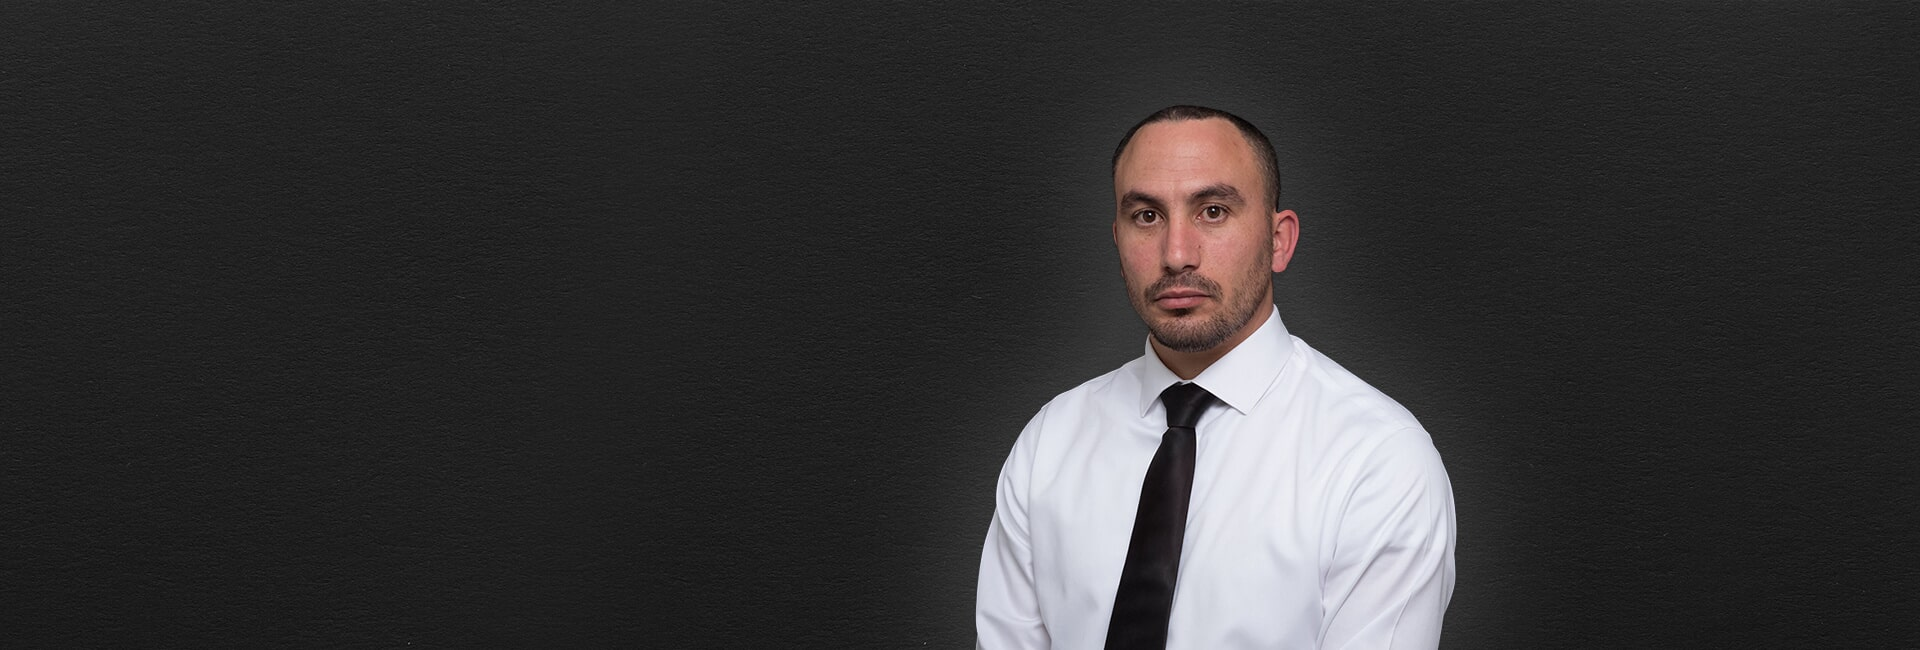 נדב גרינולד עורך דין פלילי